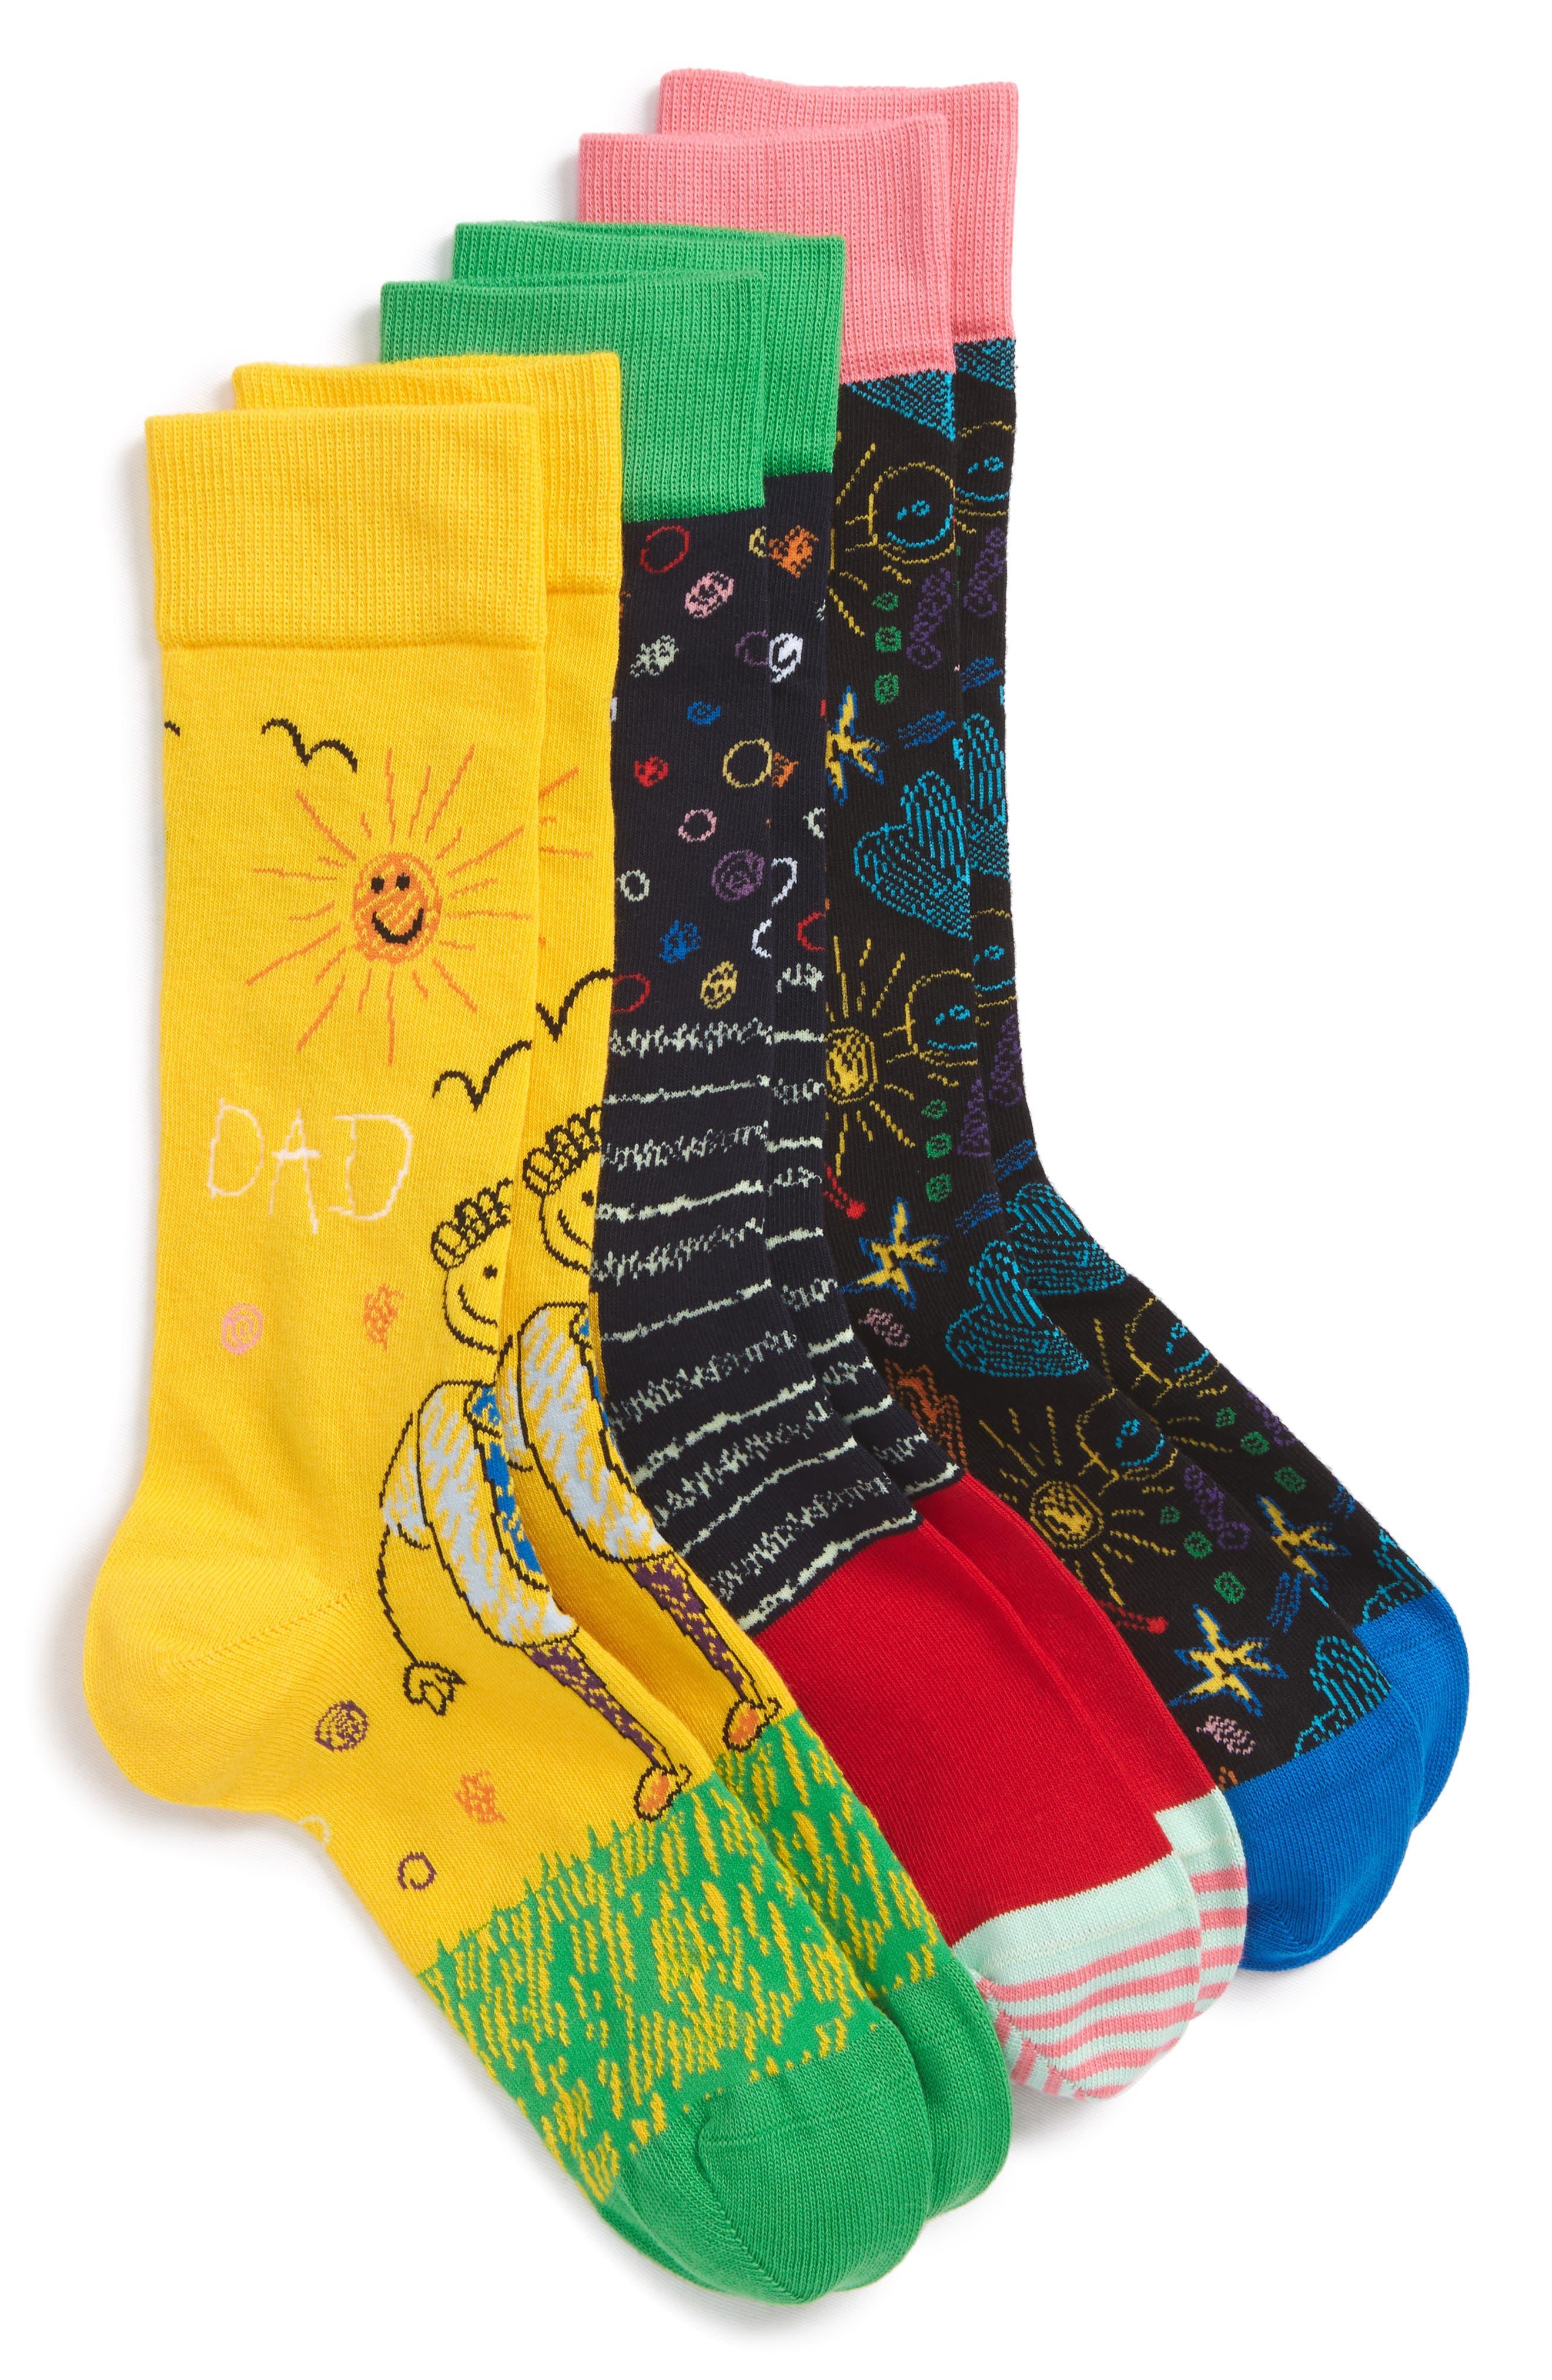 I Love You Dad 3-Pack Socks,                         Main,                         color, 014